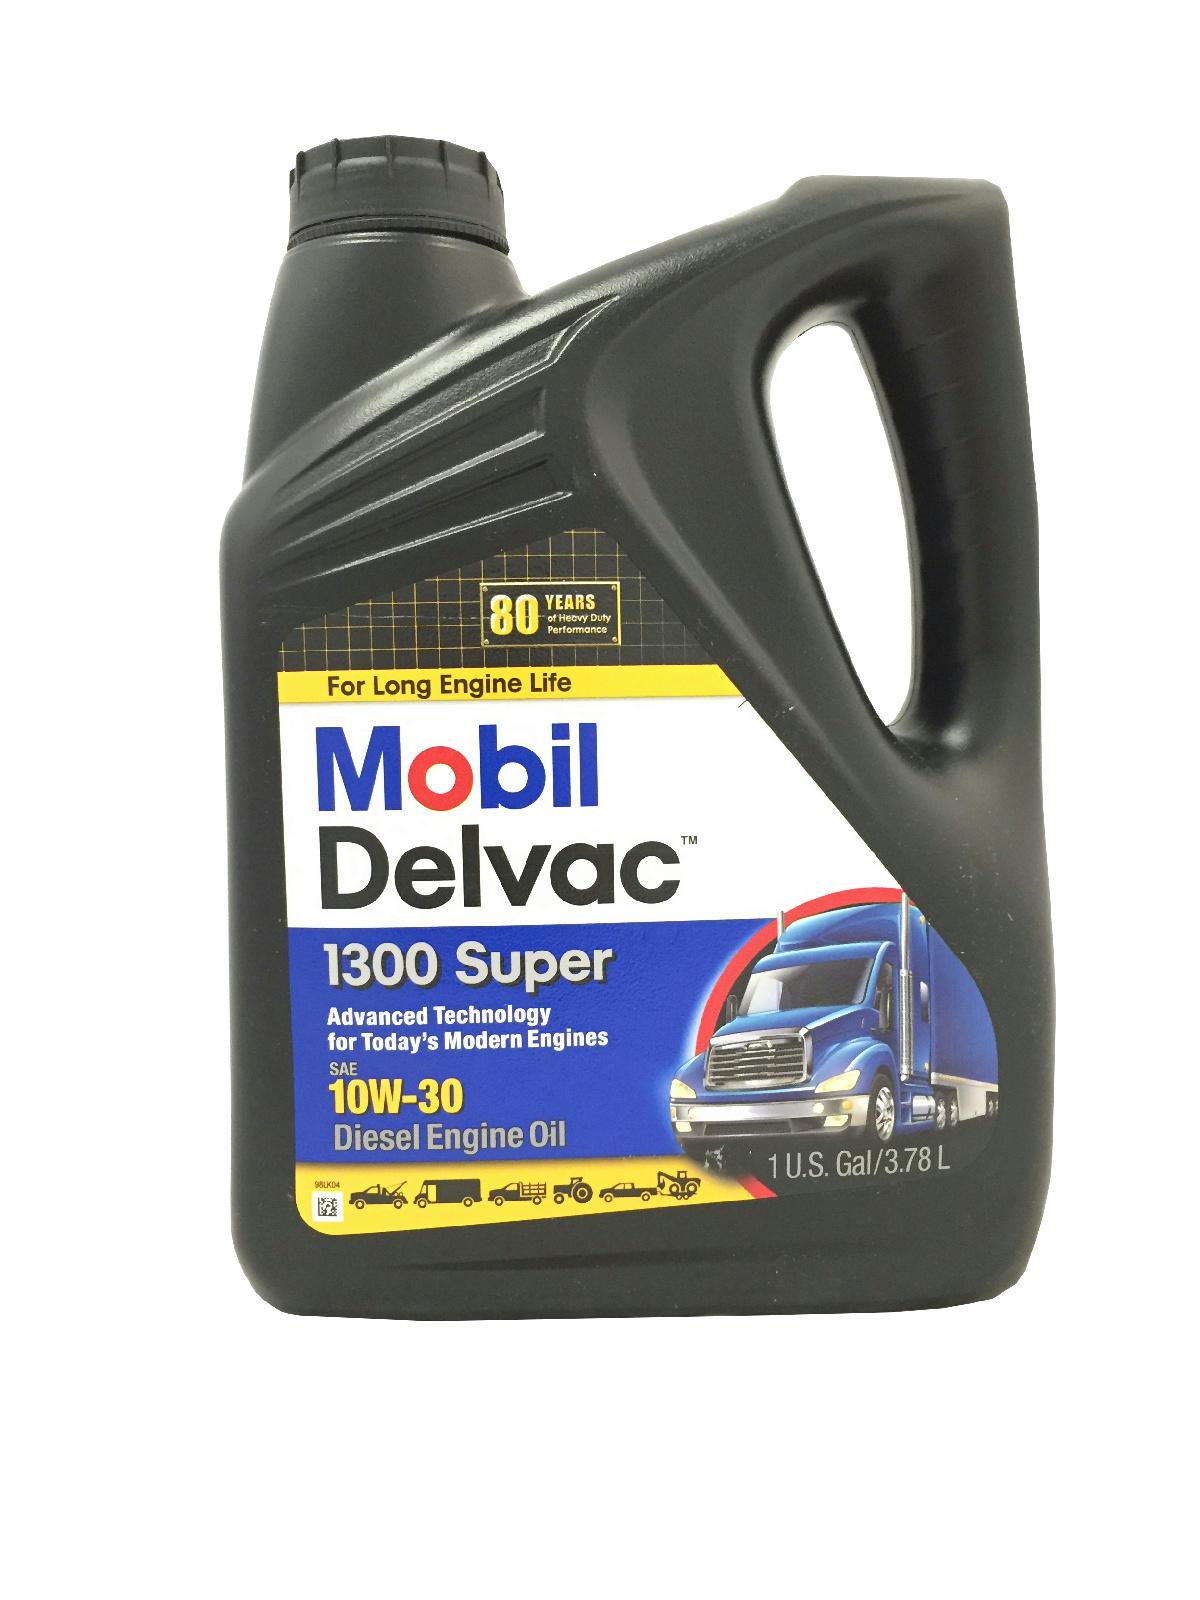 Mobil delvac 1300 10w30 diesel motor oil 1 gallon ebay for Gallon of motor oil price